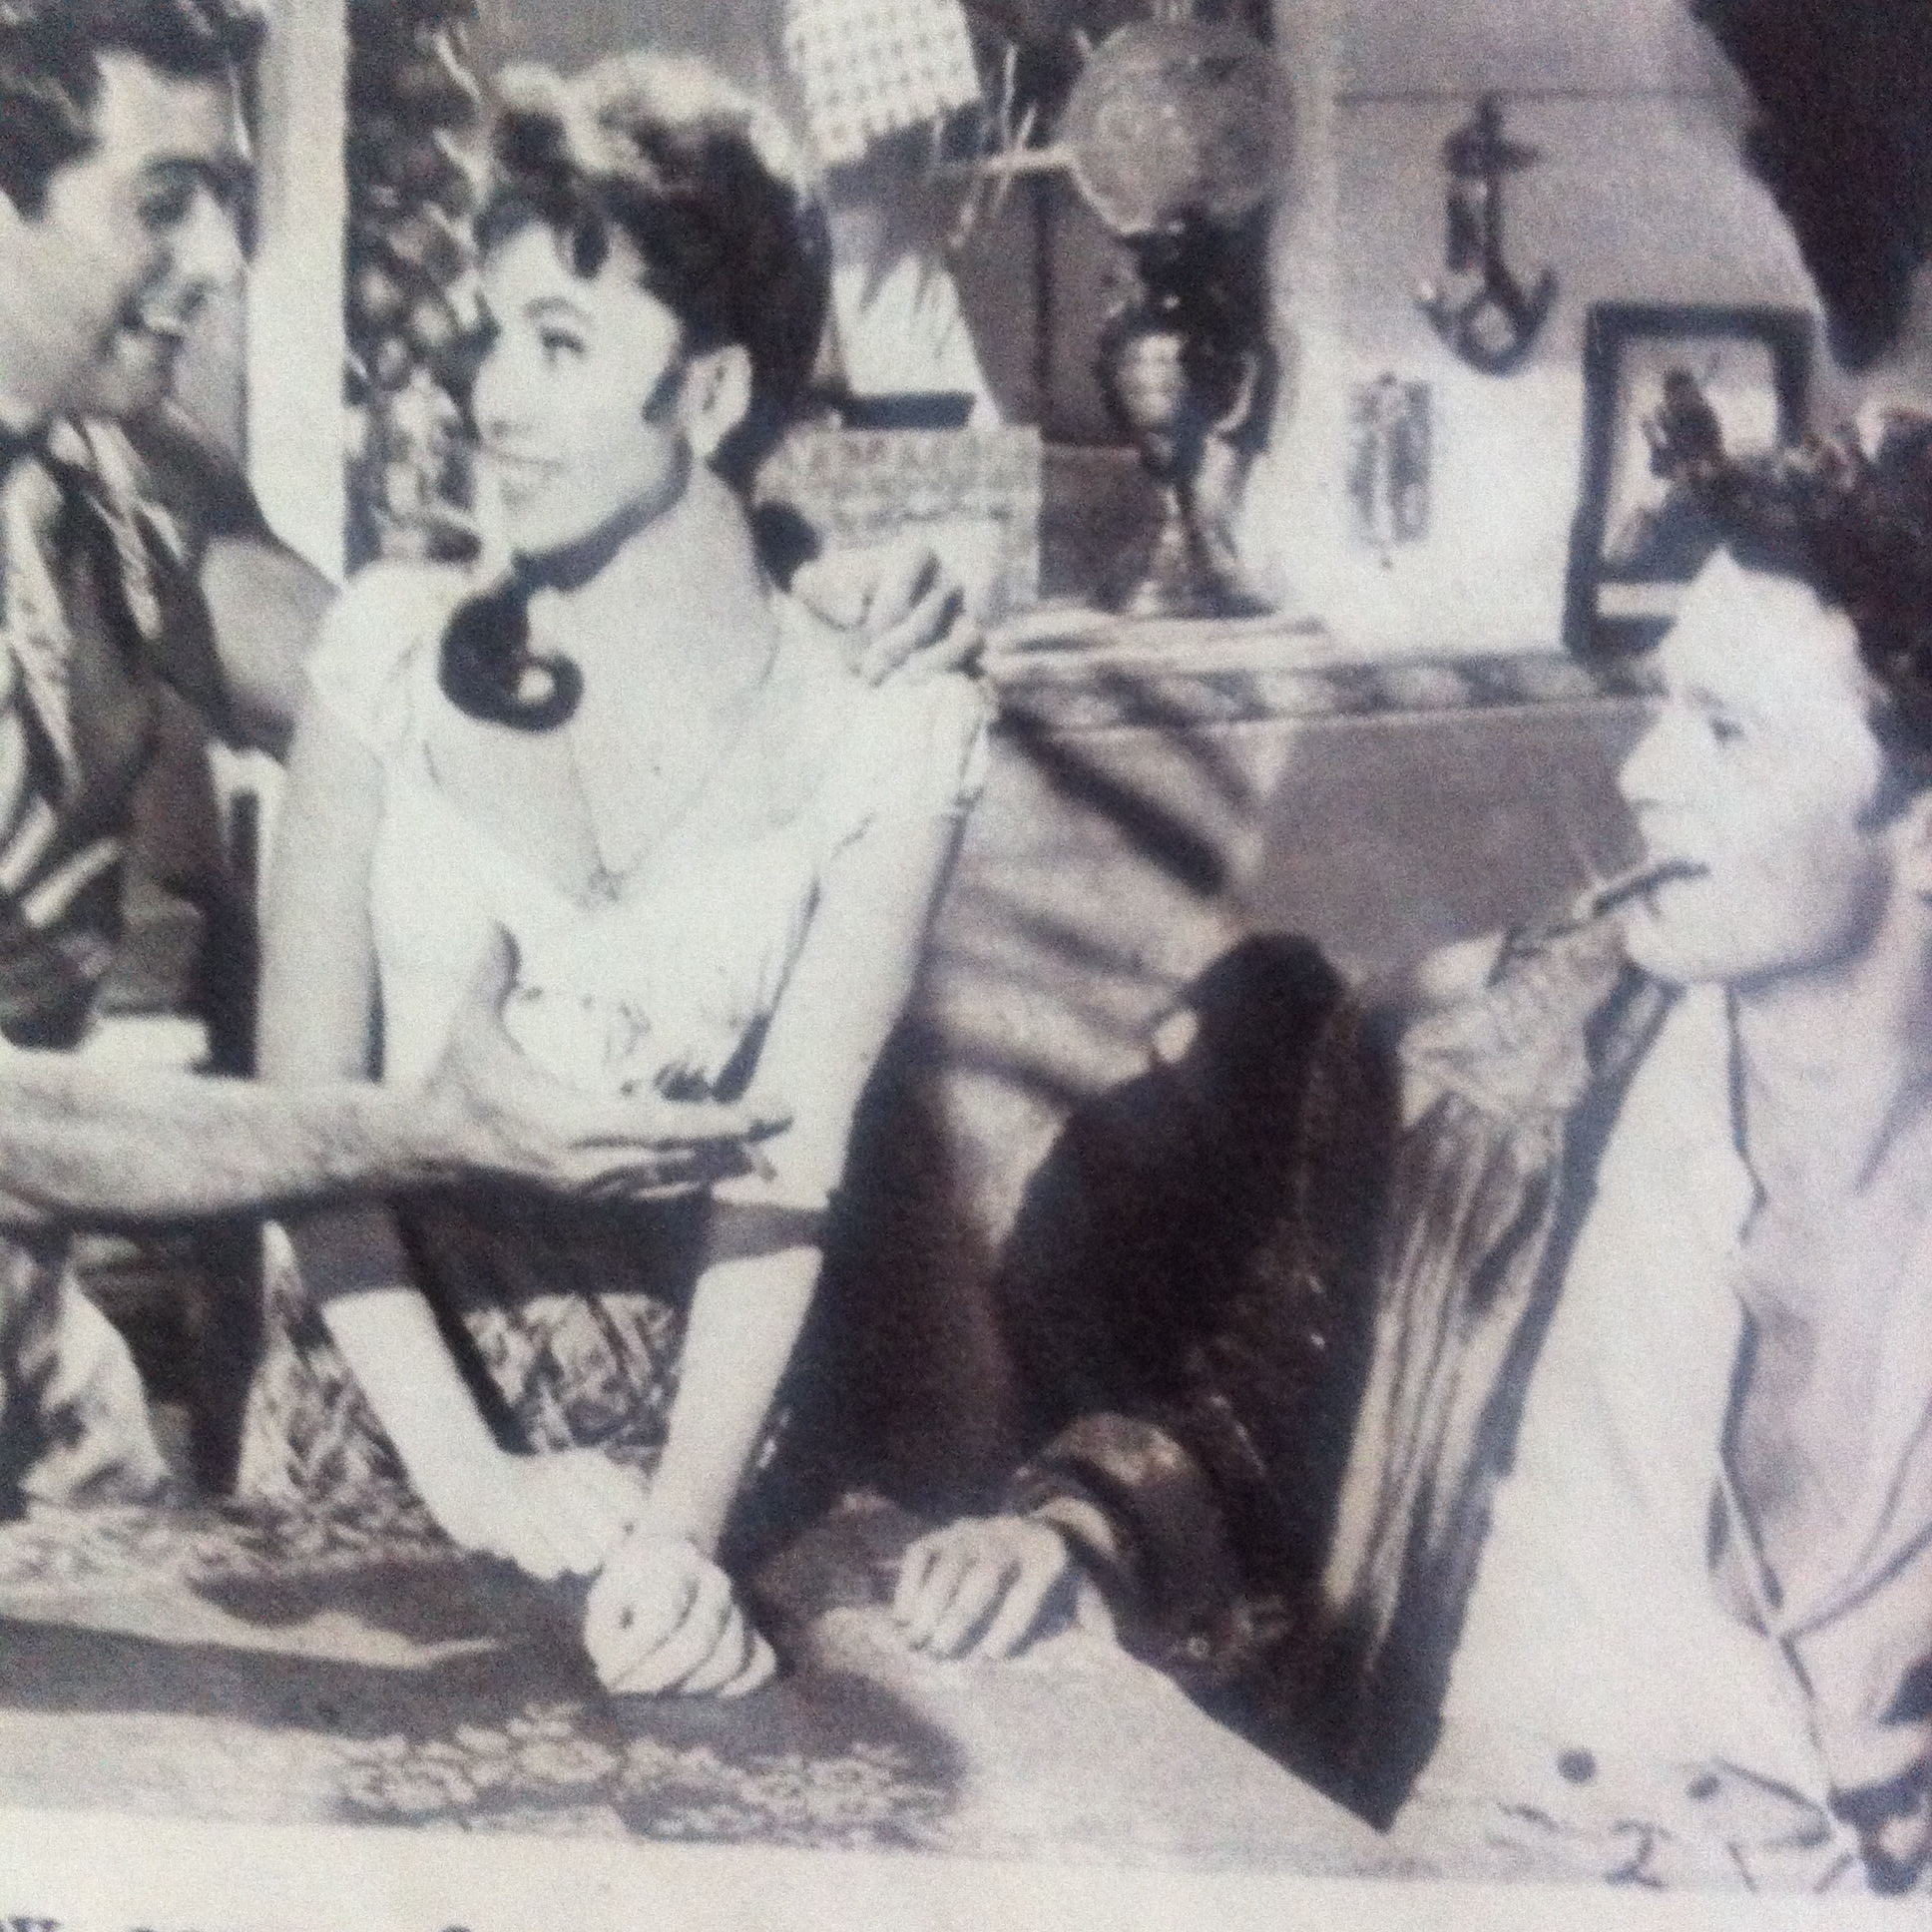 Jocelyn Lane, Jeremy Spenser, and Frankie Vaughan in Wonderful Things (1958)